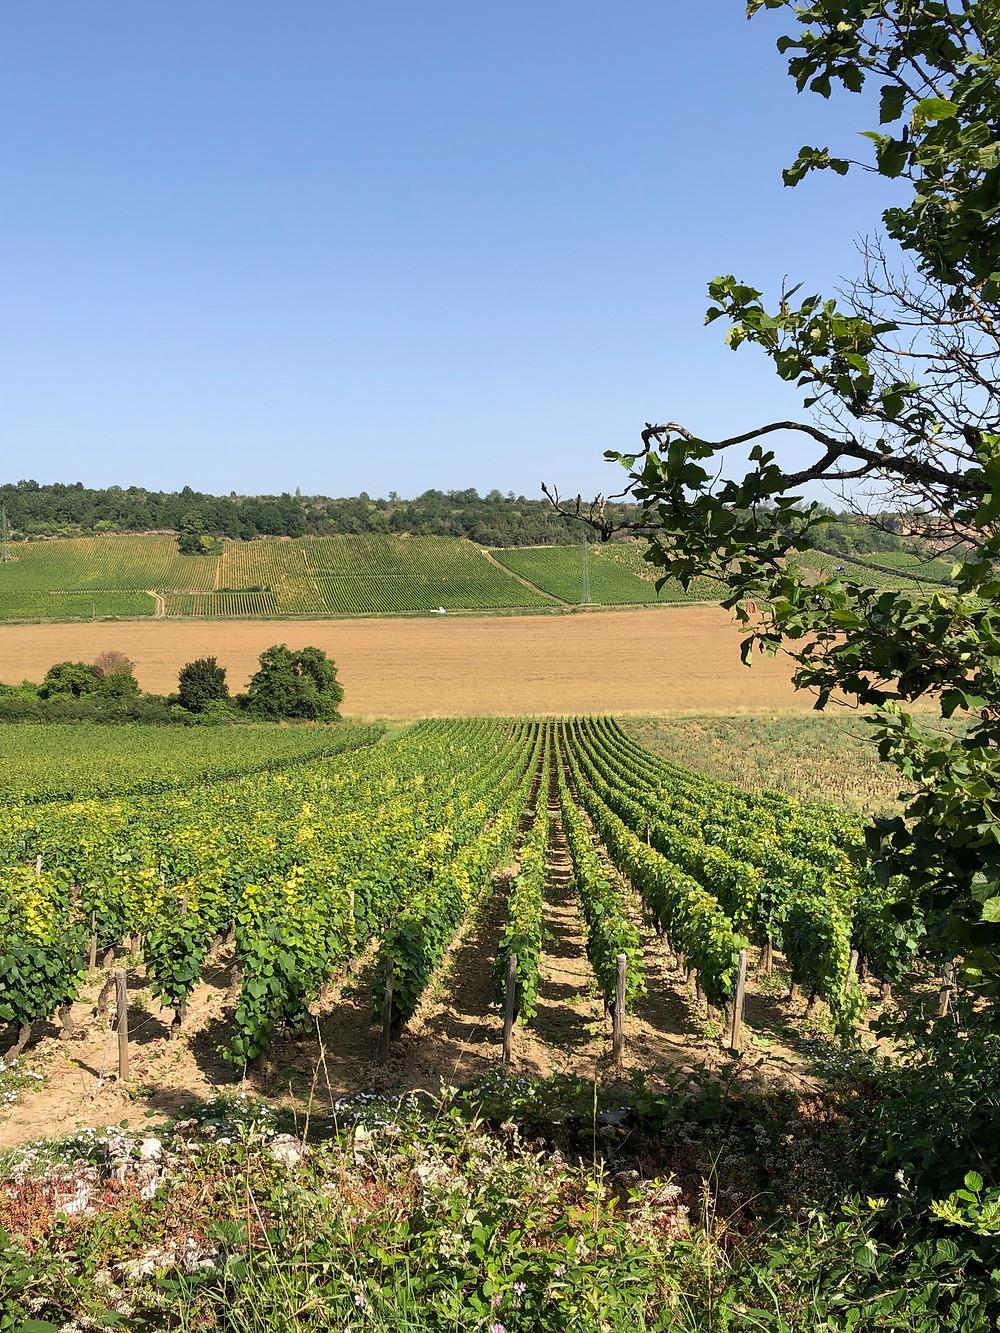 Aliogote vineyarss in Bouzeron AOC in Southern Burgundy